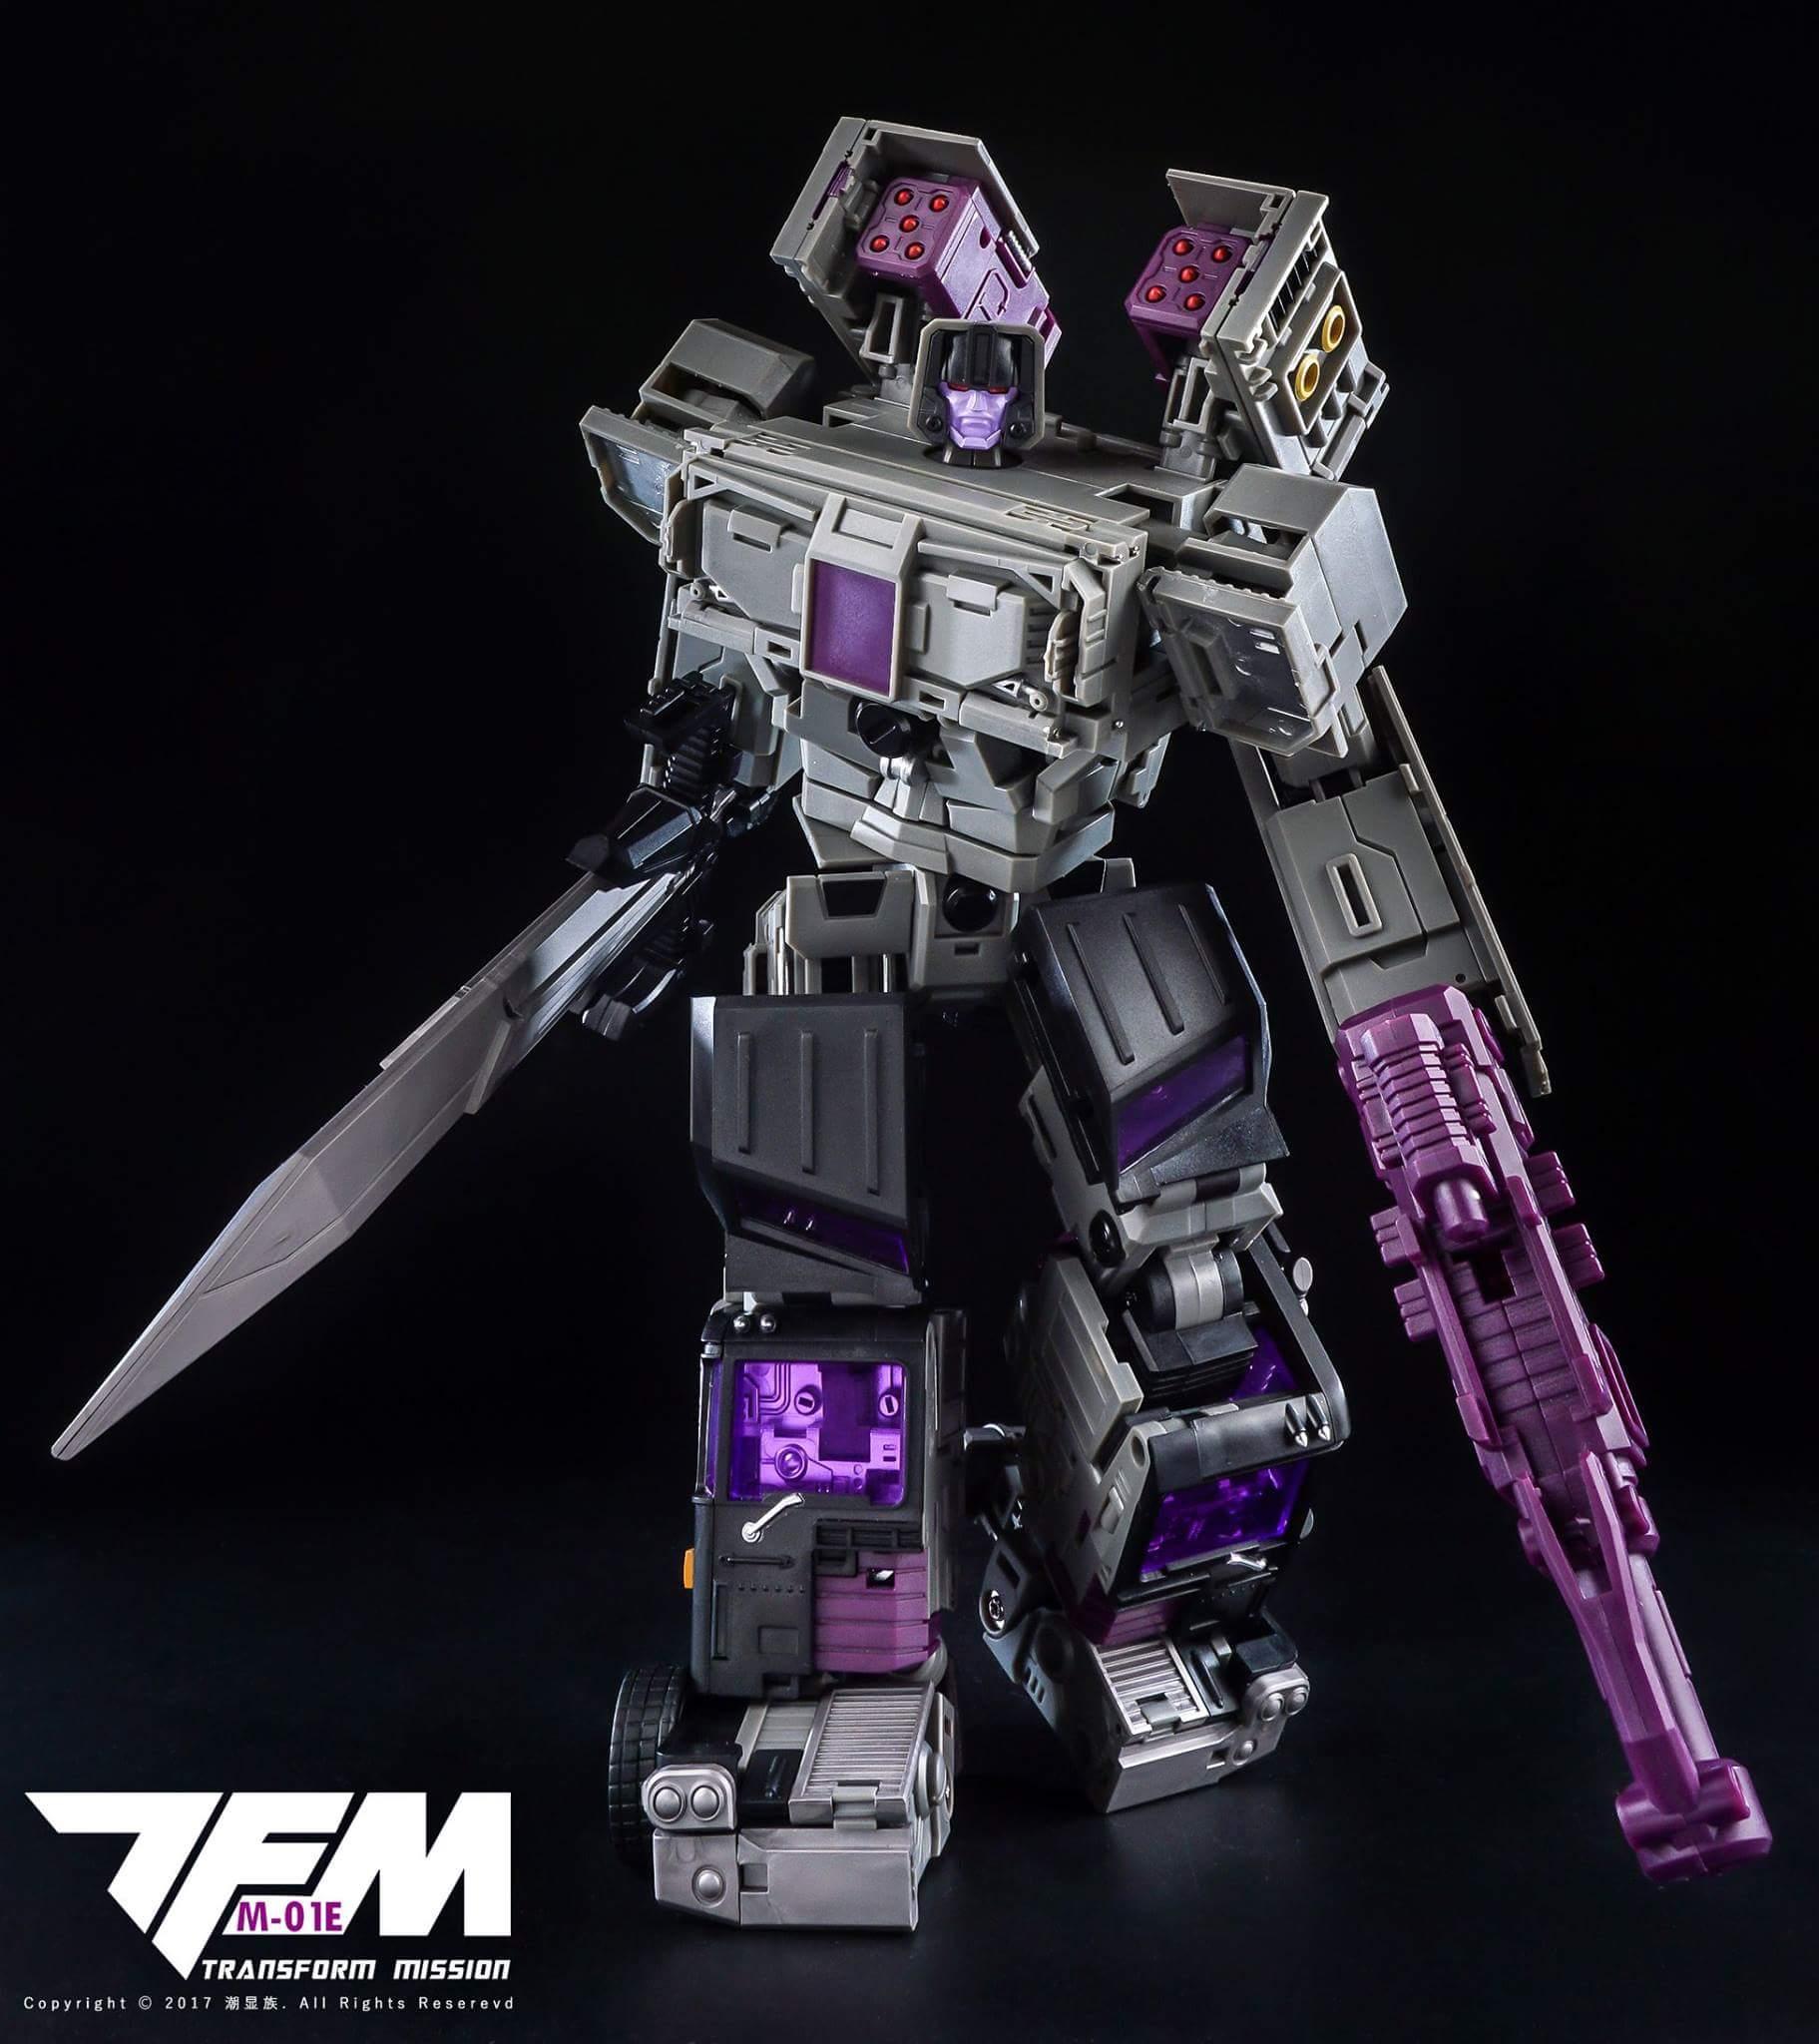 [Transform Mission] Produit Tiers - Jouet M-01 AutoSamurai - aka Menasor/Menaseur des BD IDW - Page 4 VWMkOata